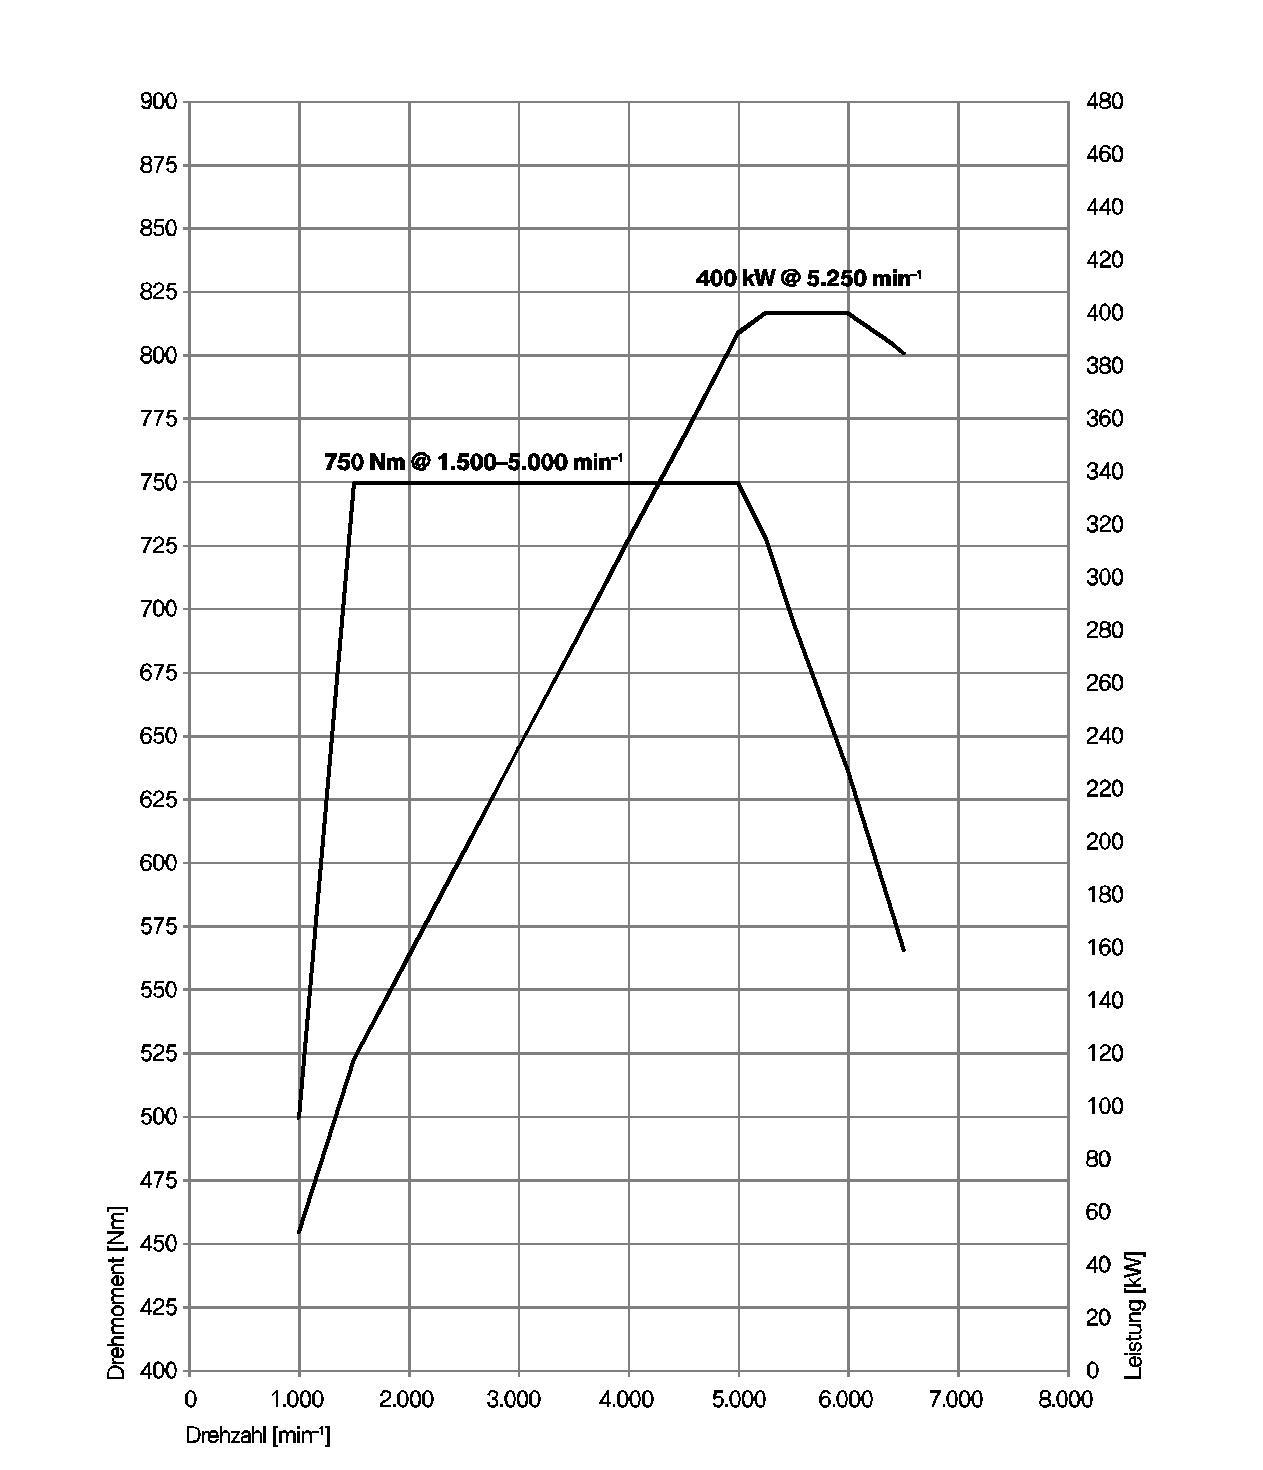 Technische Details zum V12-Motor N74 aus 760i / 760Li